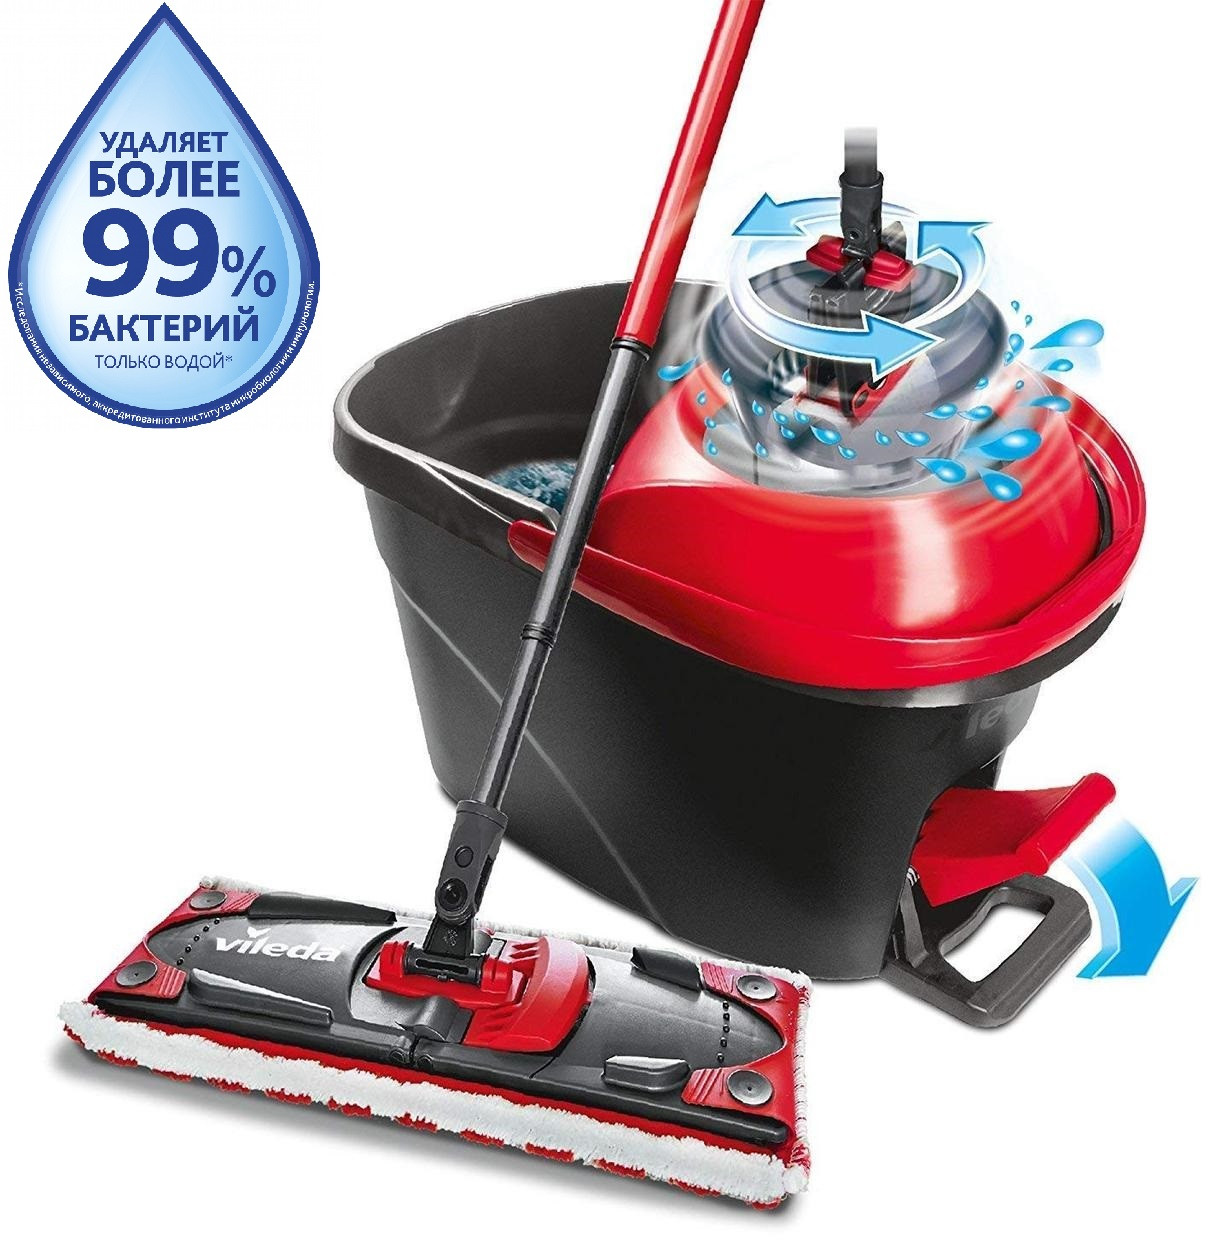 Набор для уборки Vileda Ultramat Turbo (швабра и ведро с отжимом) (4023103206236)